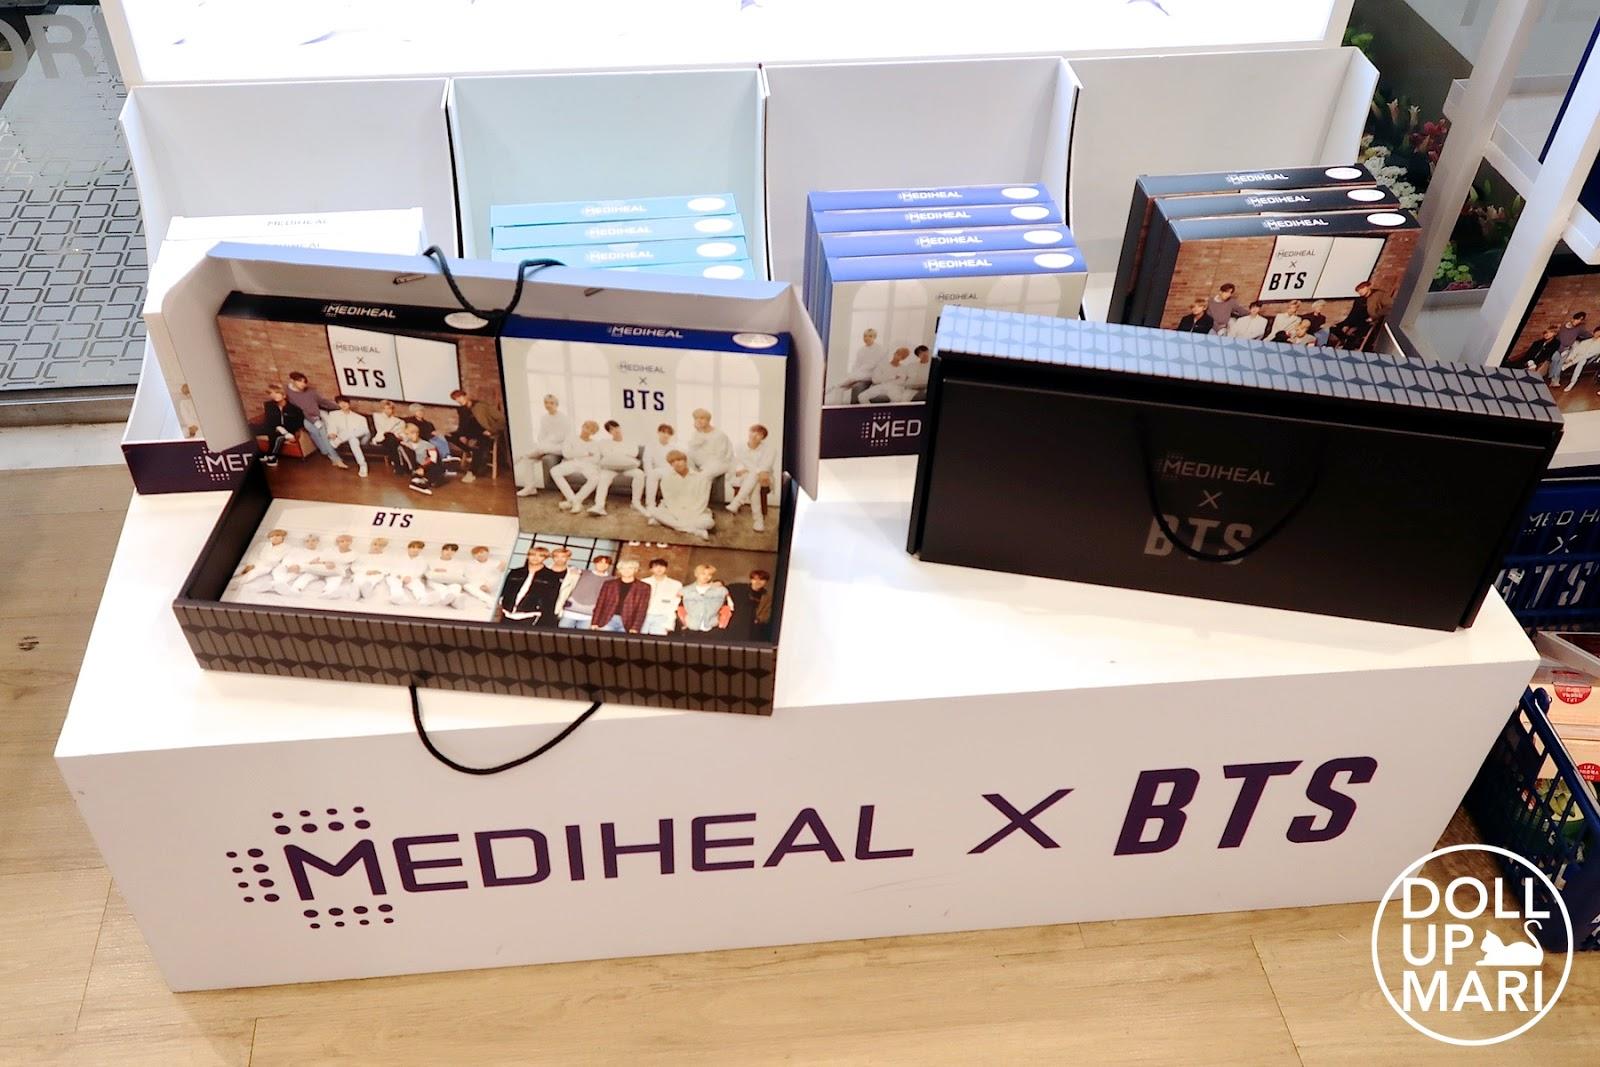 Mediheal X BTS Masks Limited Edition Boxes On Display On Shelf